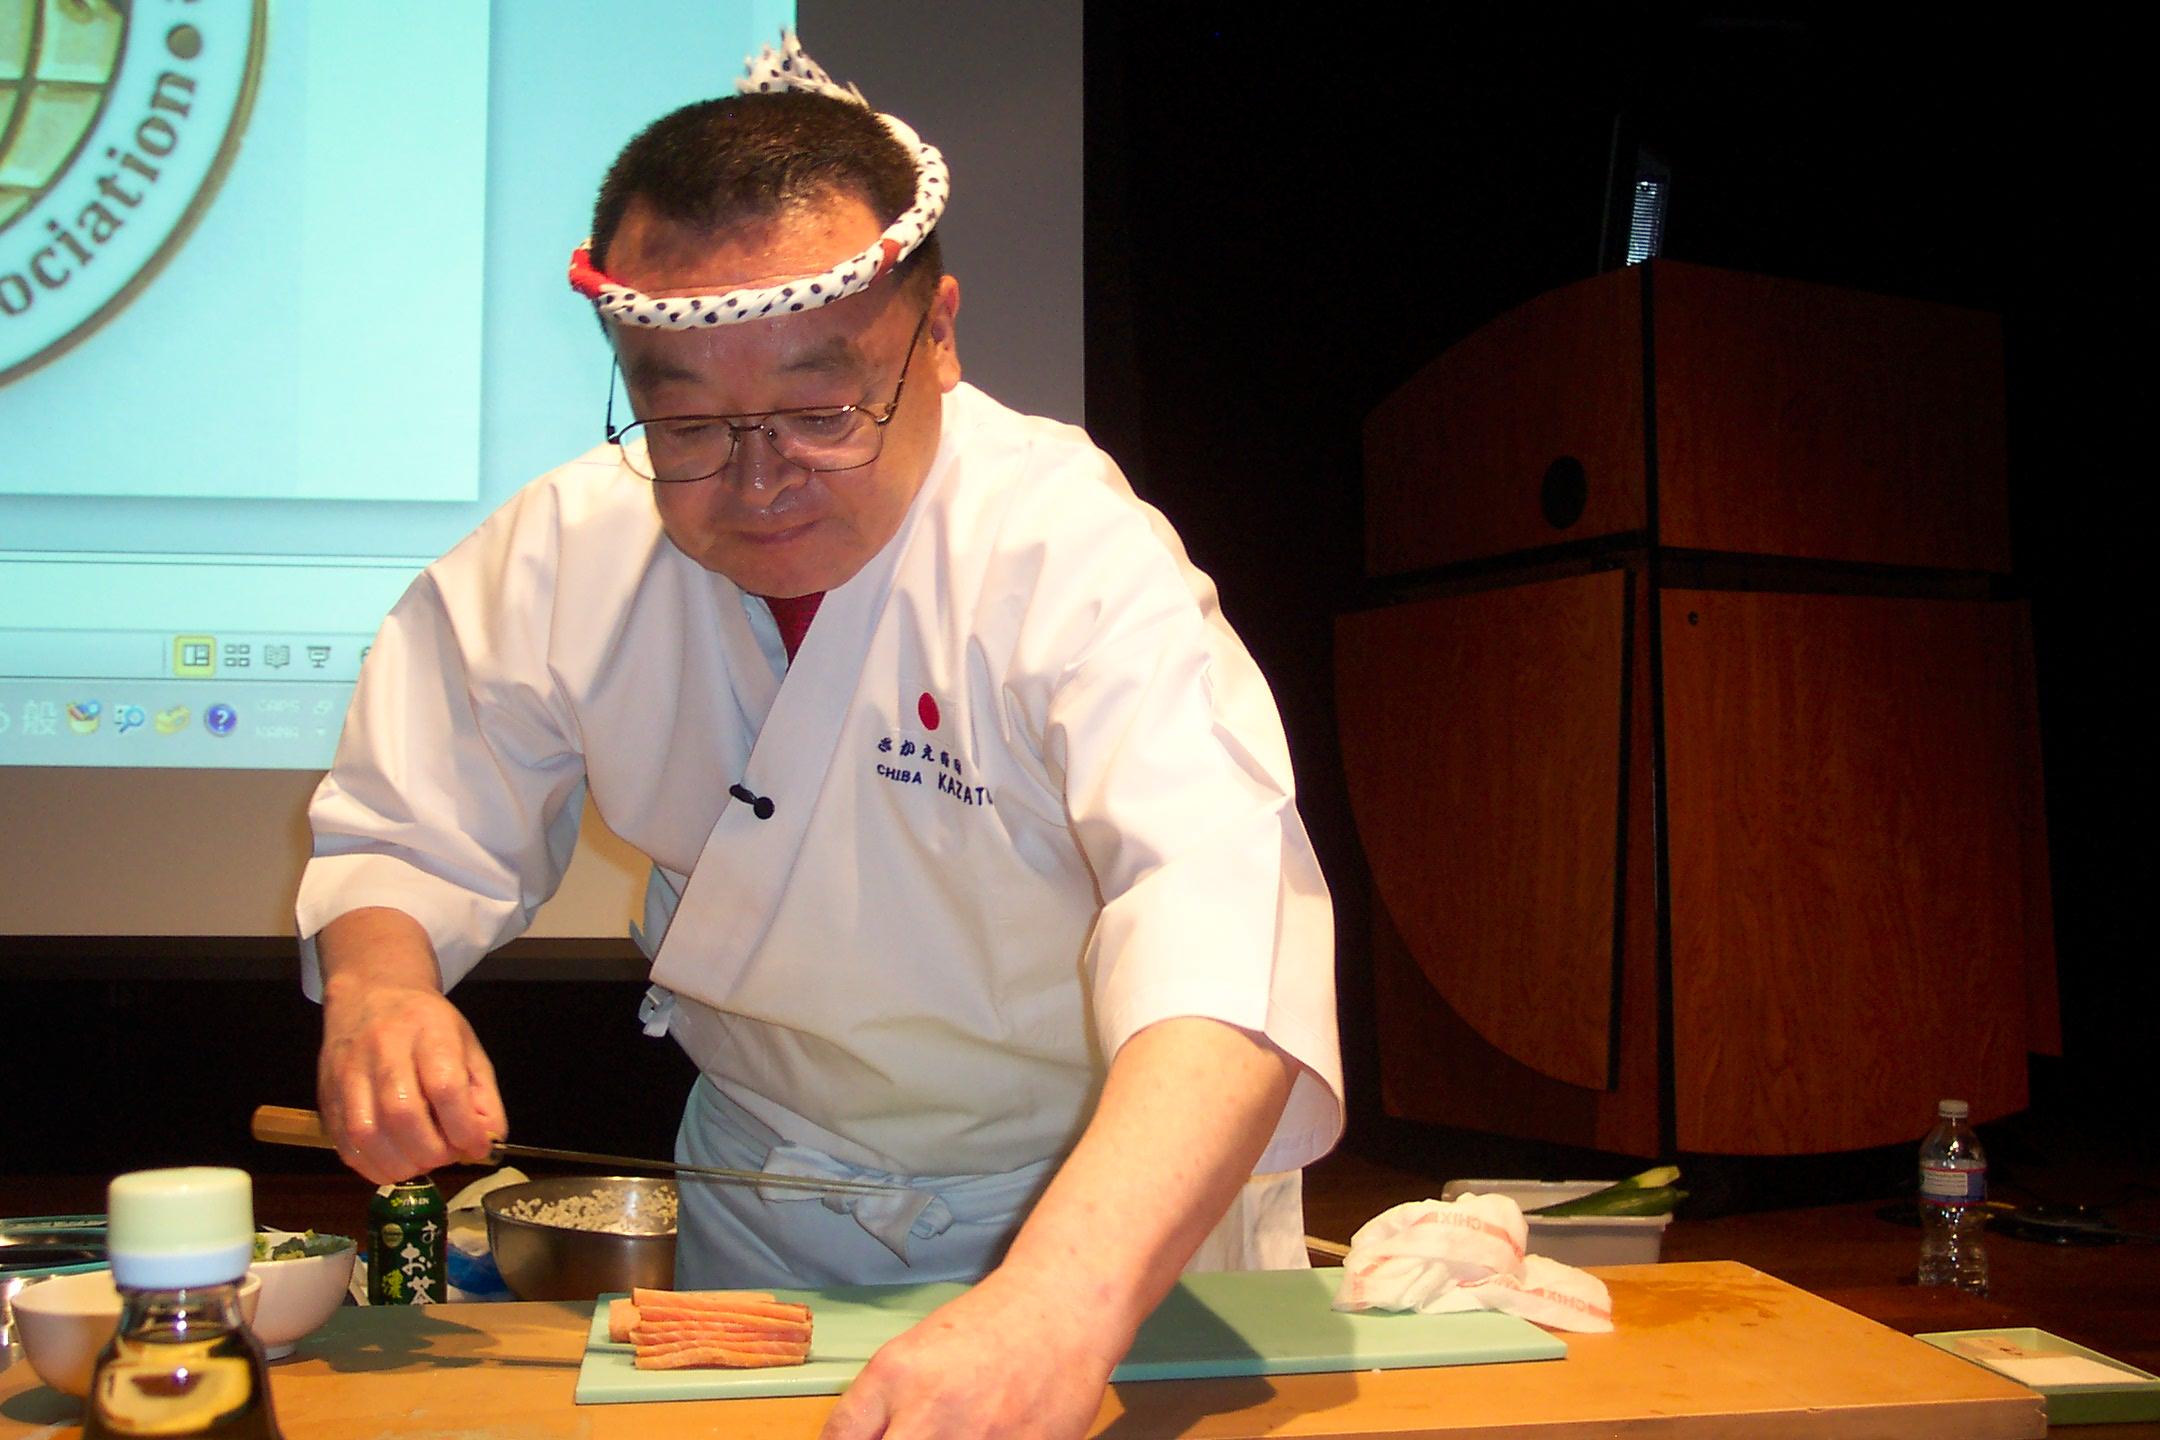 Japanese Sushi Chef Bandana b64390942a0